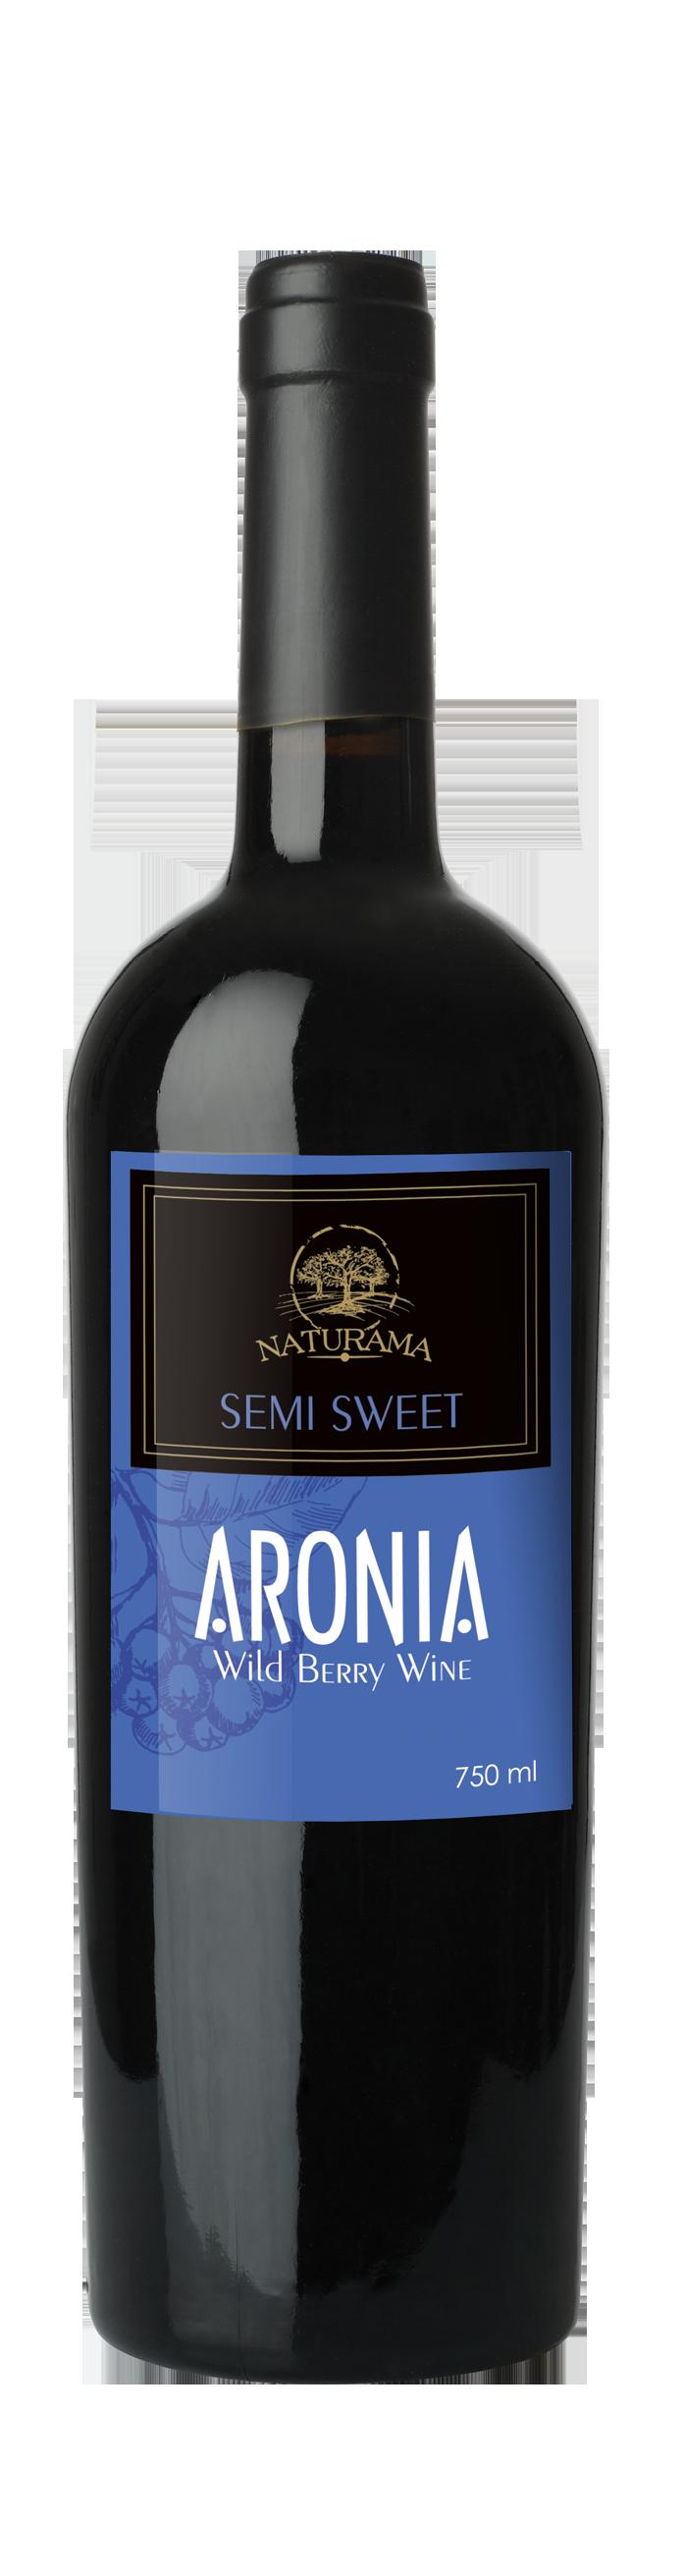 Aronia – Wild Berry Wine (SEMI SWEET)